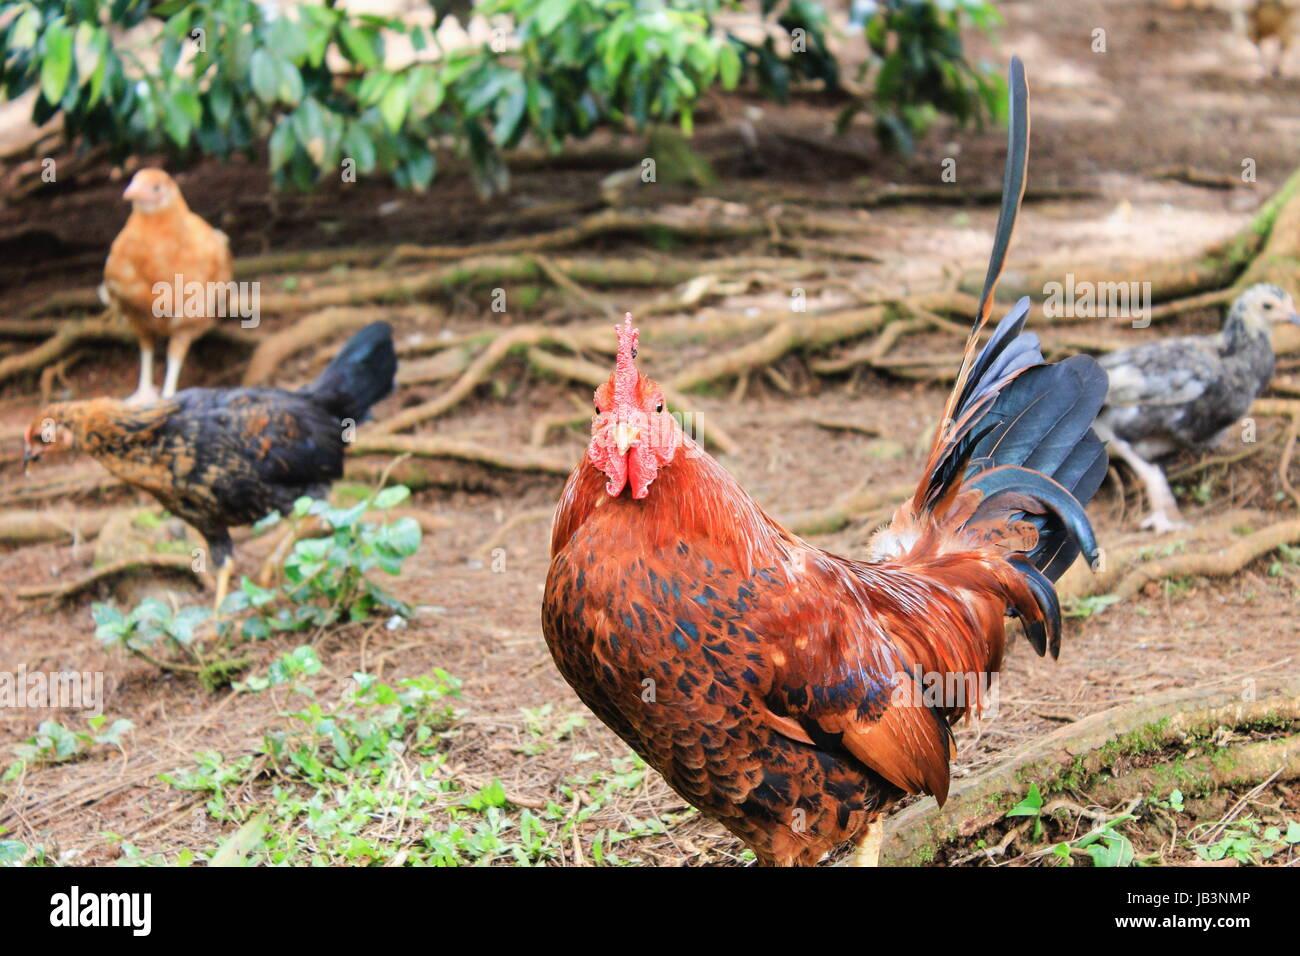 Free Range Chicken - Stock Image